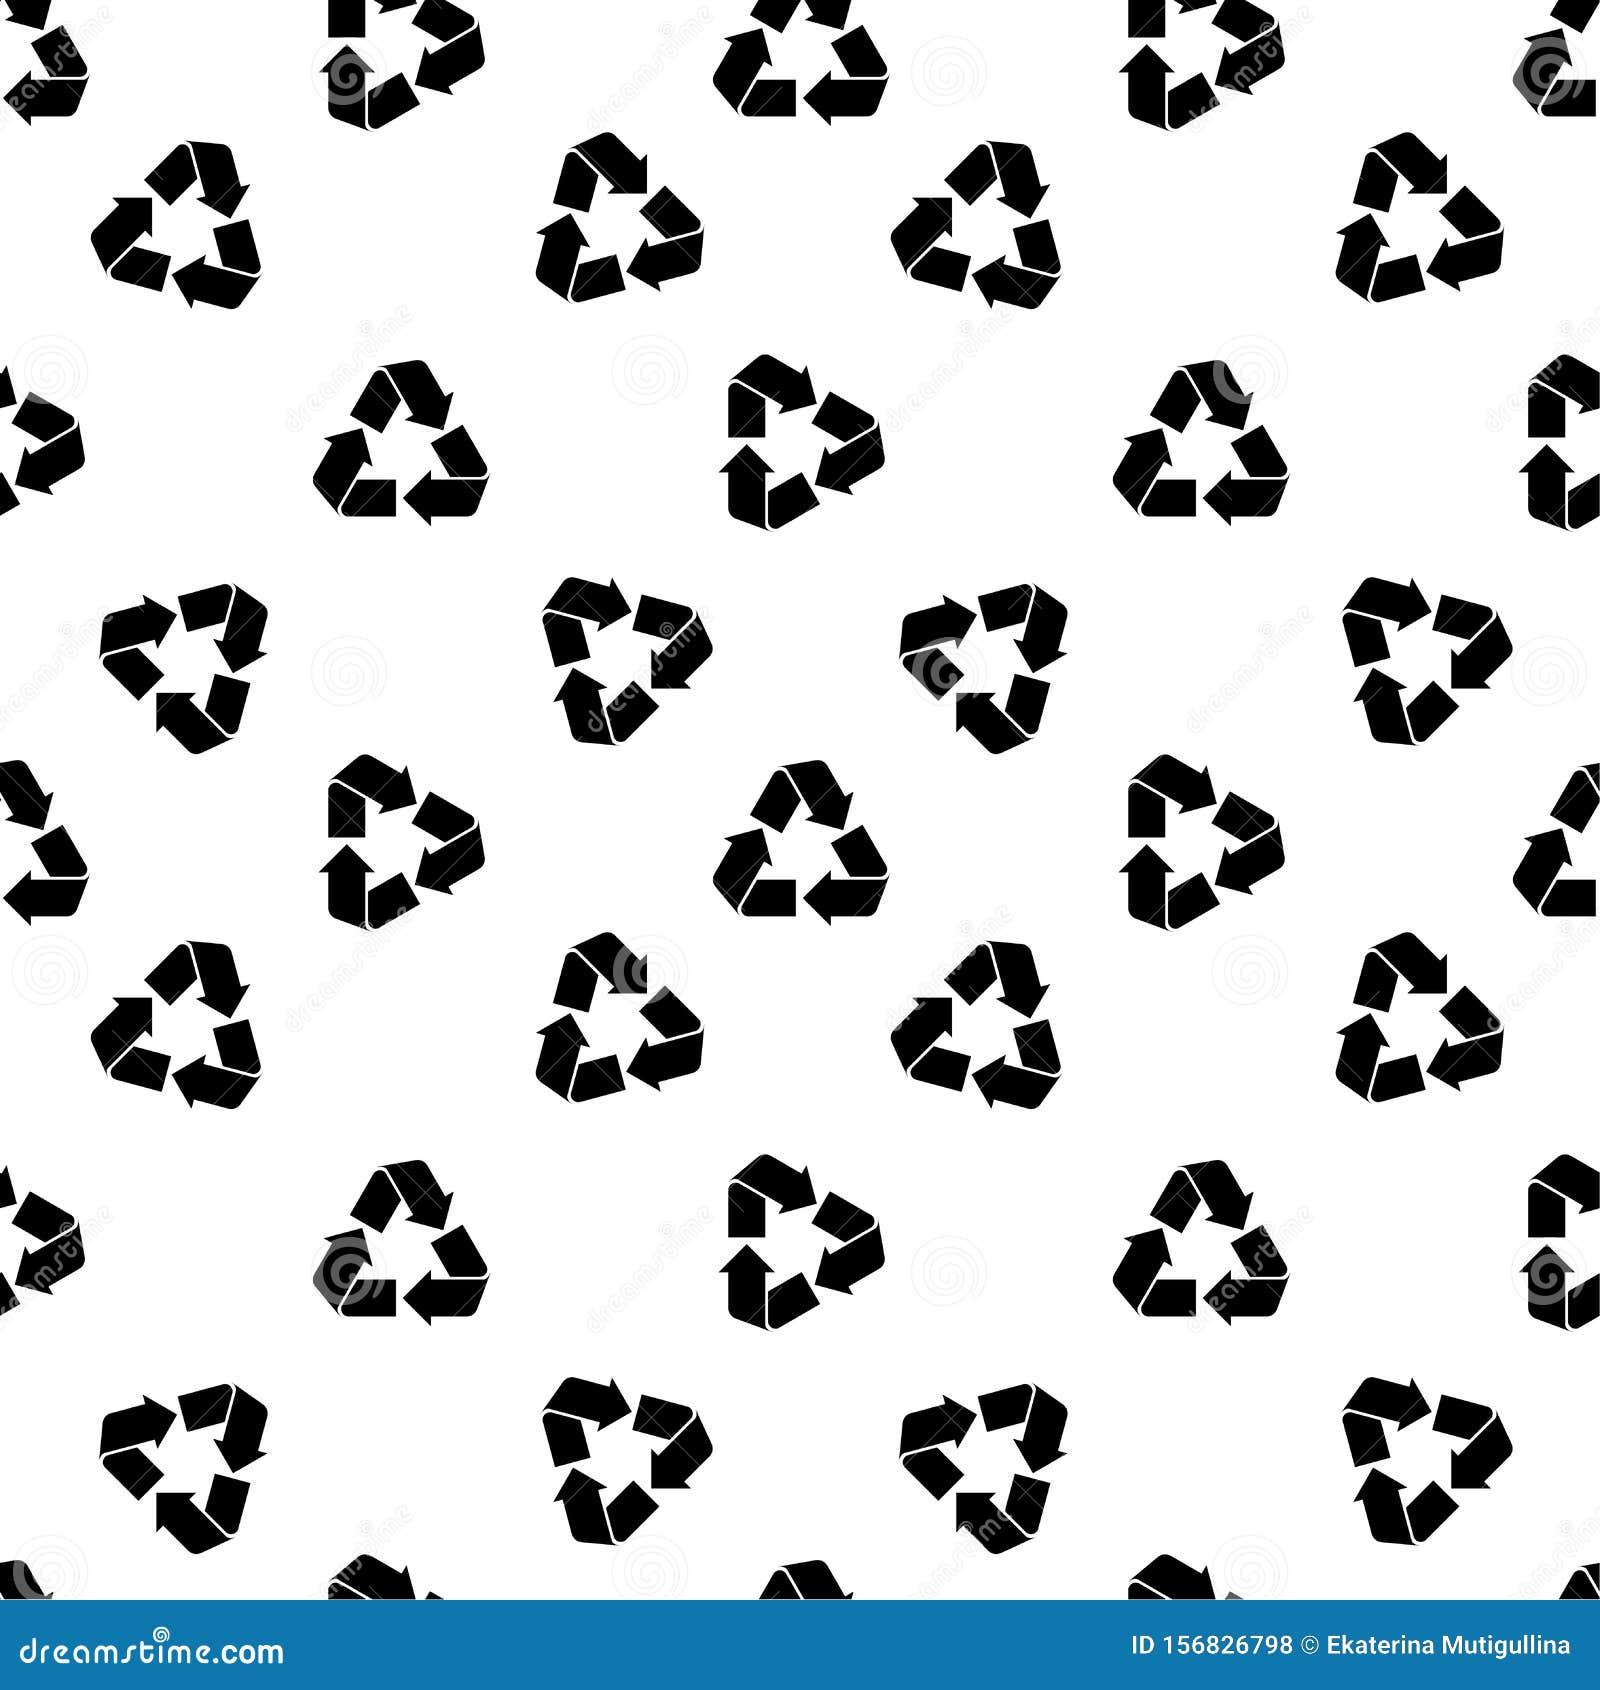 Seamless recycling pattern white